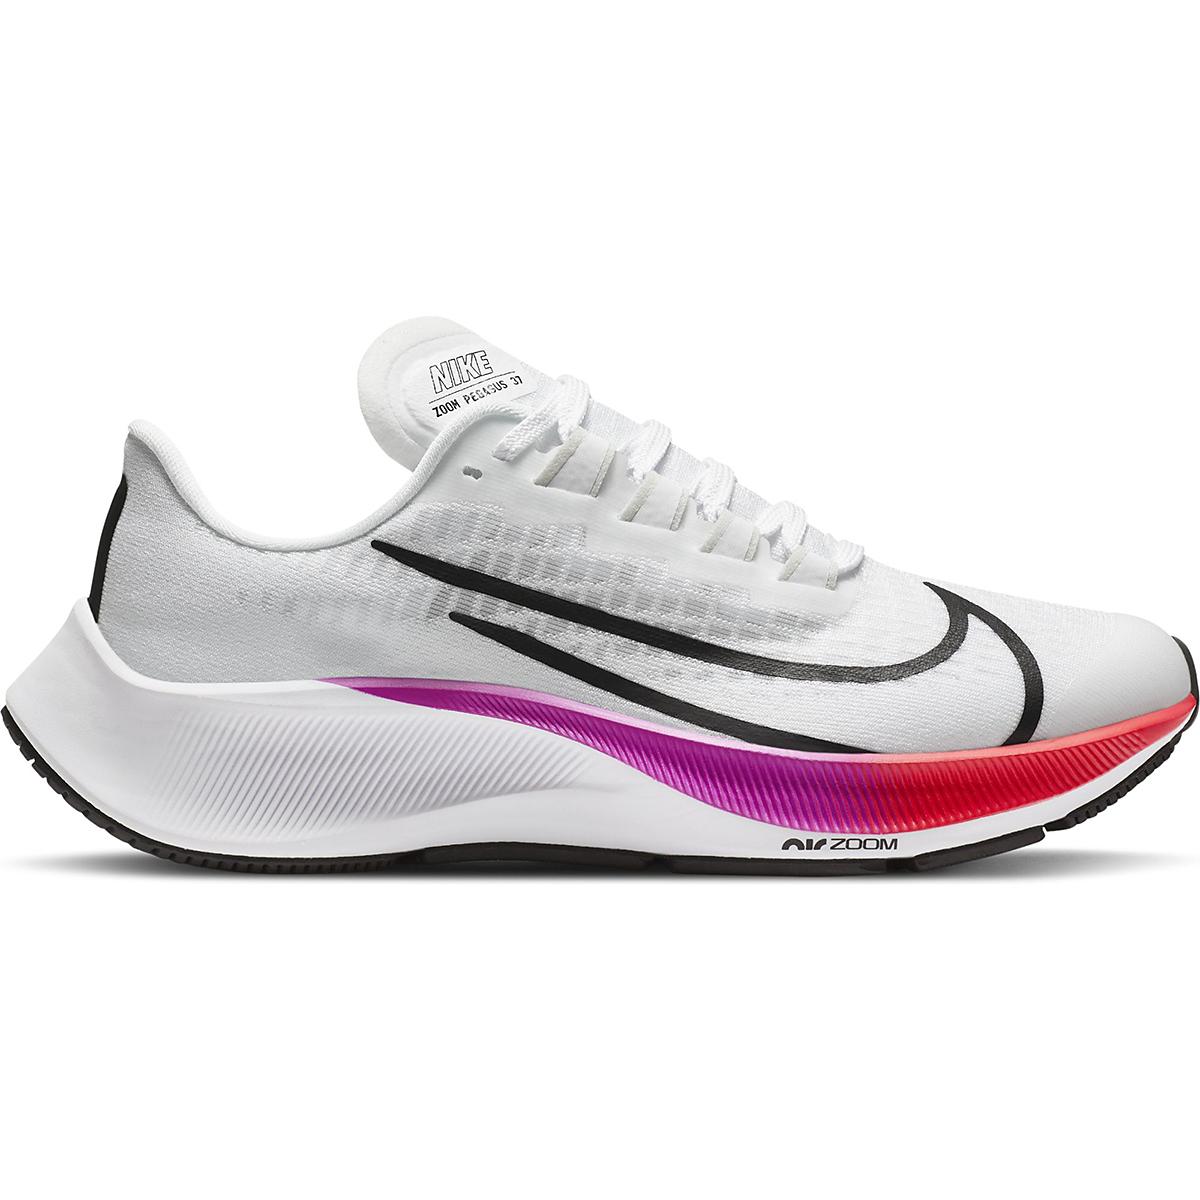 Kid's Nike Grade School Air Zoom Pegasus 37 Running Shoe - Color: White/Jade Aura-Flash Crimson - Size: 1 - Width: Regular, White/Jade Aura-Flash Crimson, large, image 1